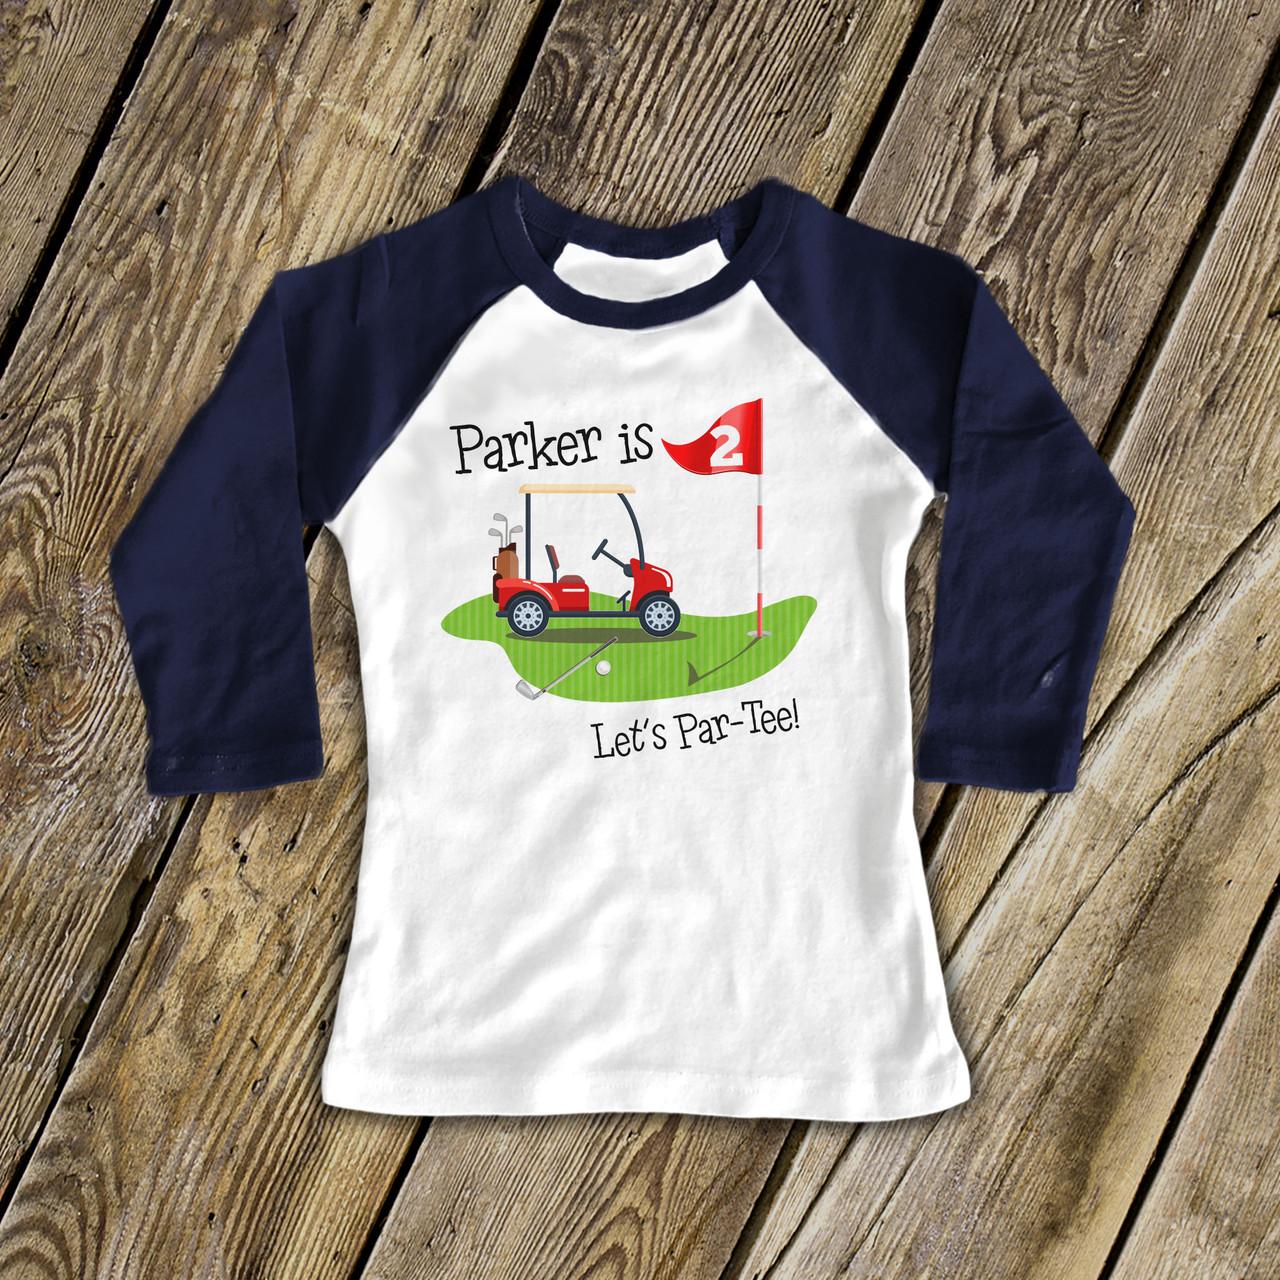 Pack My Stuff Toddler//Kids Raglan T-Shirt Im Going Golfing with My Nana